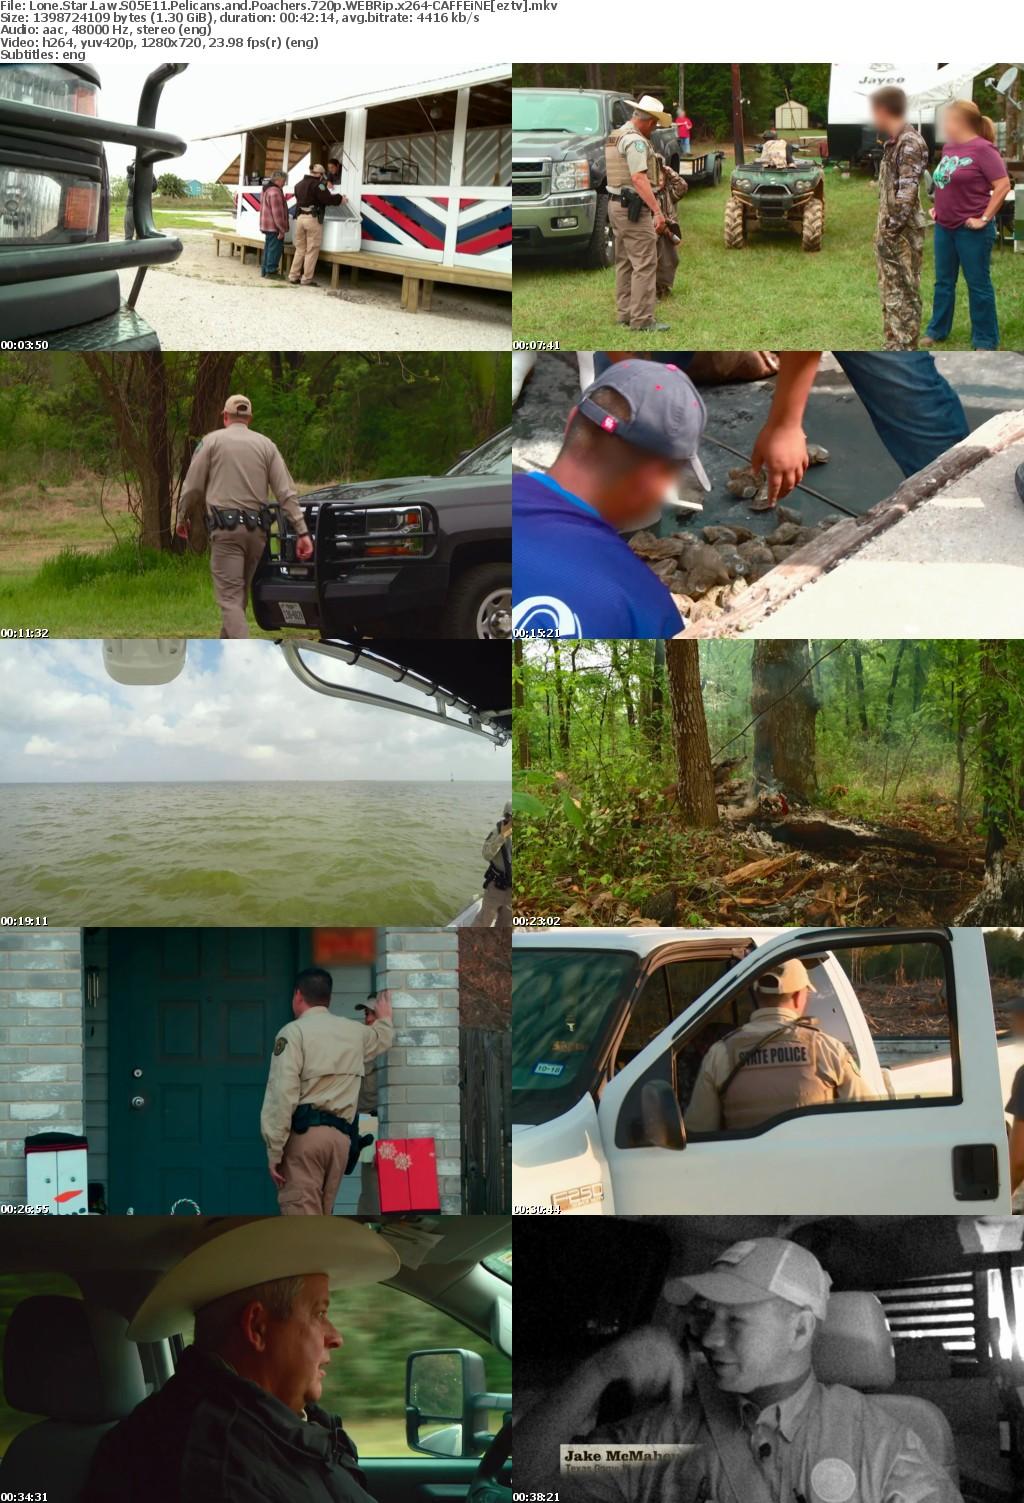 Lone Star Law S05E11 Pelicans and Poachers 720p WEBRip x264 CAFFEiNE